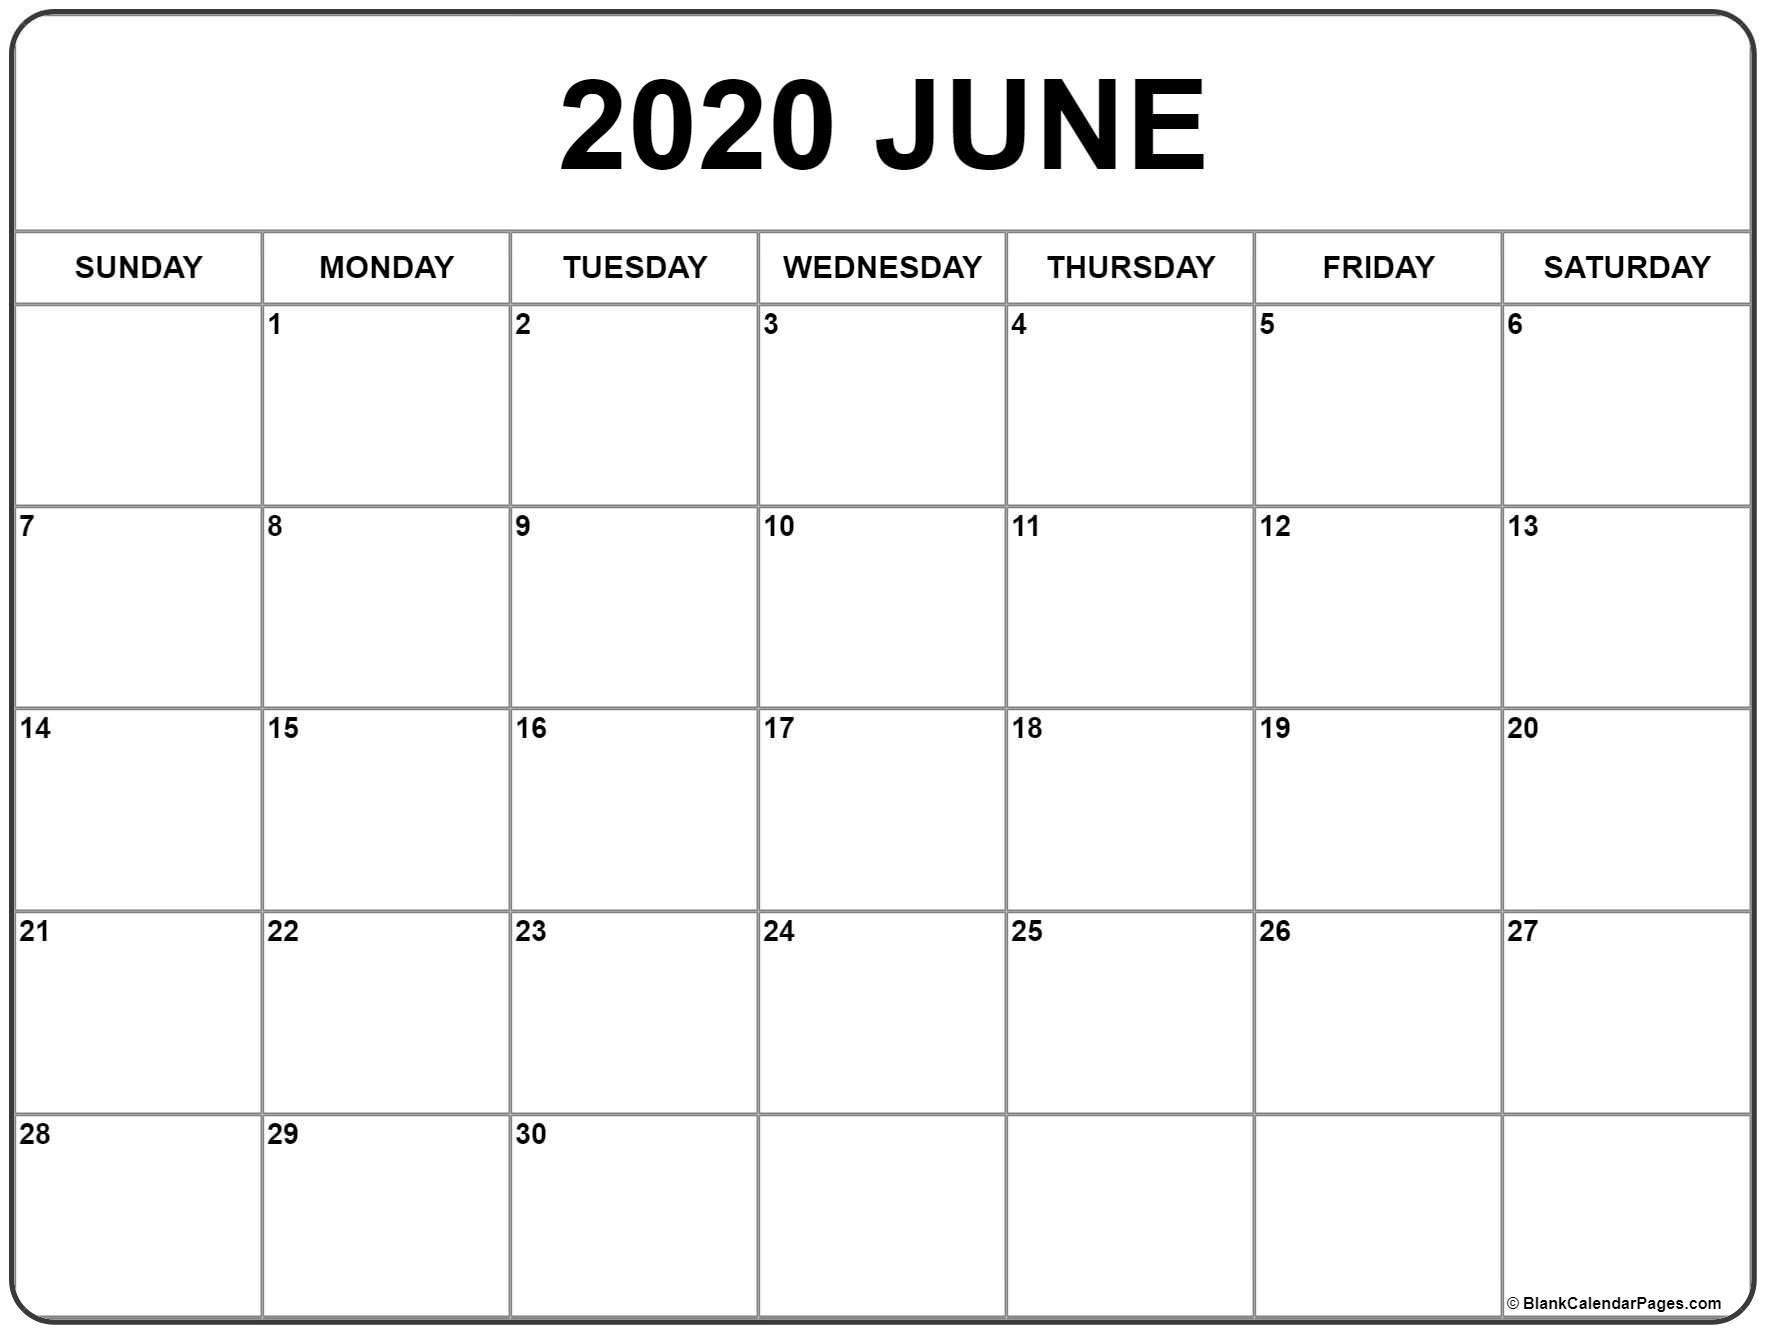 June 2020 Calendar | Free Printable Monthly Calendars in Printable Calendar June 2019 To June 2020